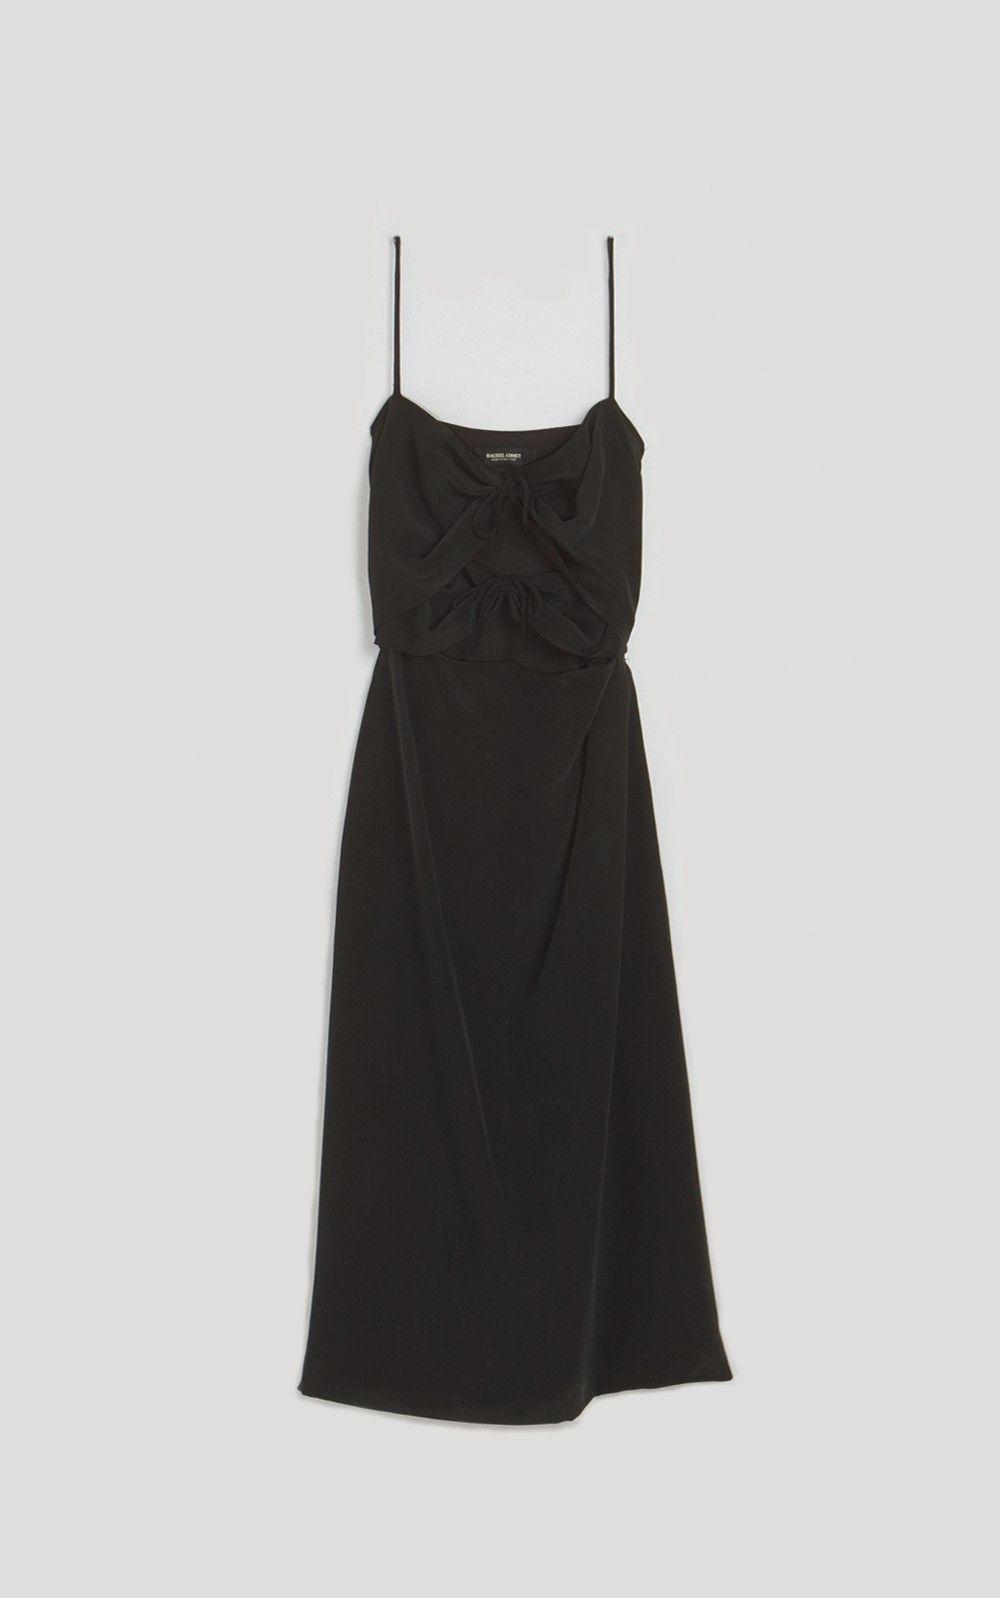 Rachel comey chernist dress dresses clothing womenus store